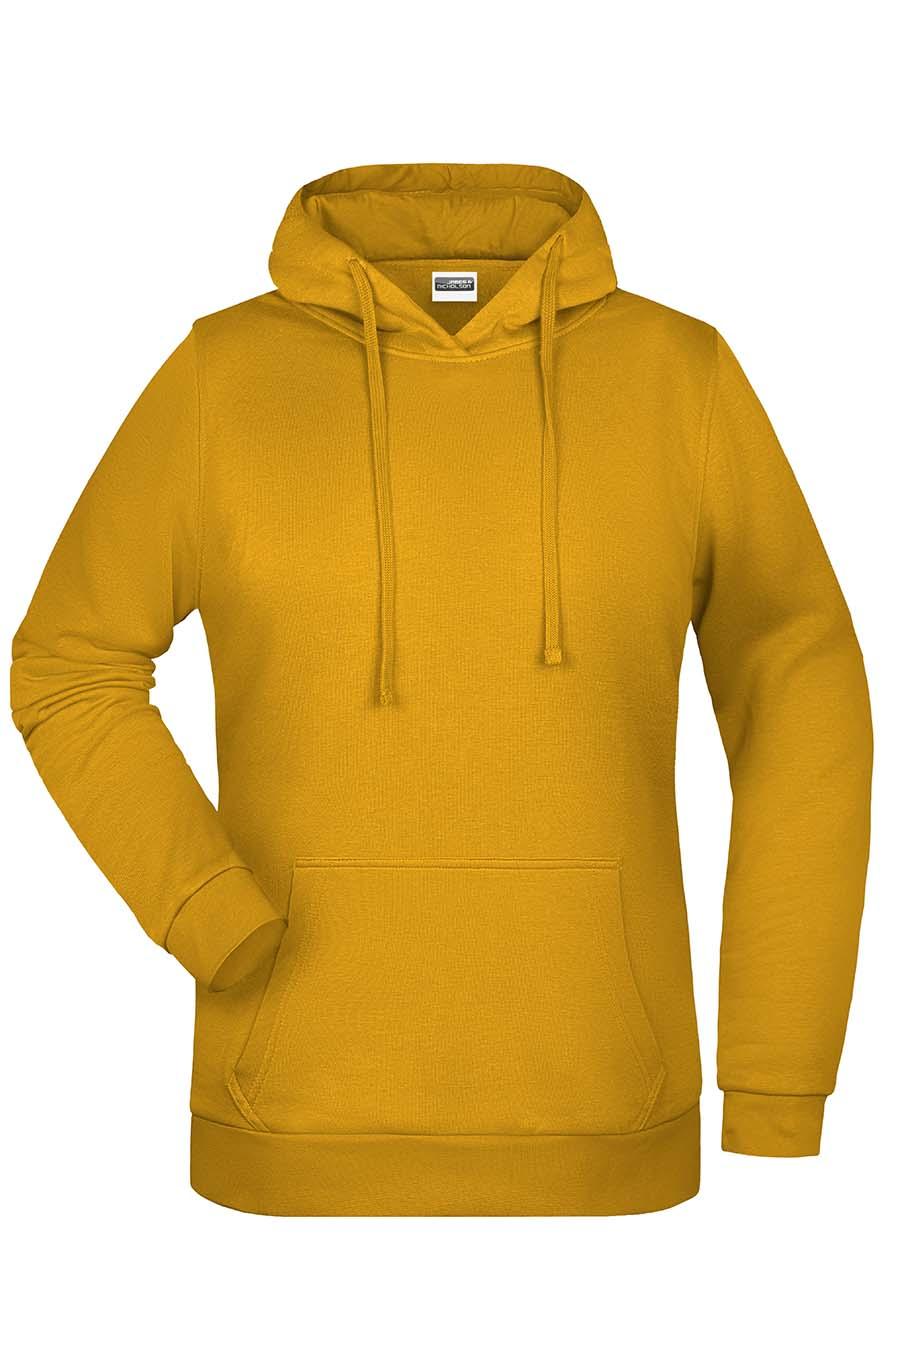 Sweat-shirt capuche femme - 20-1494-8